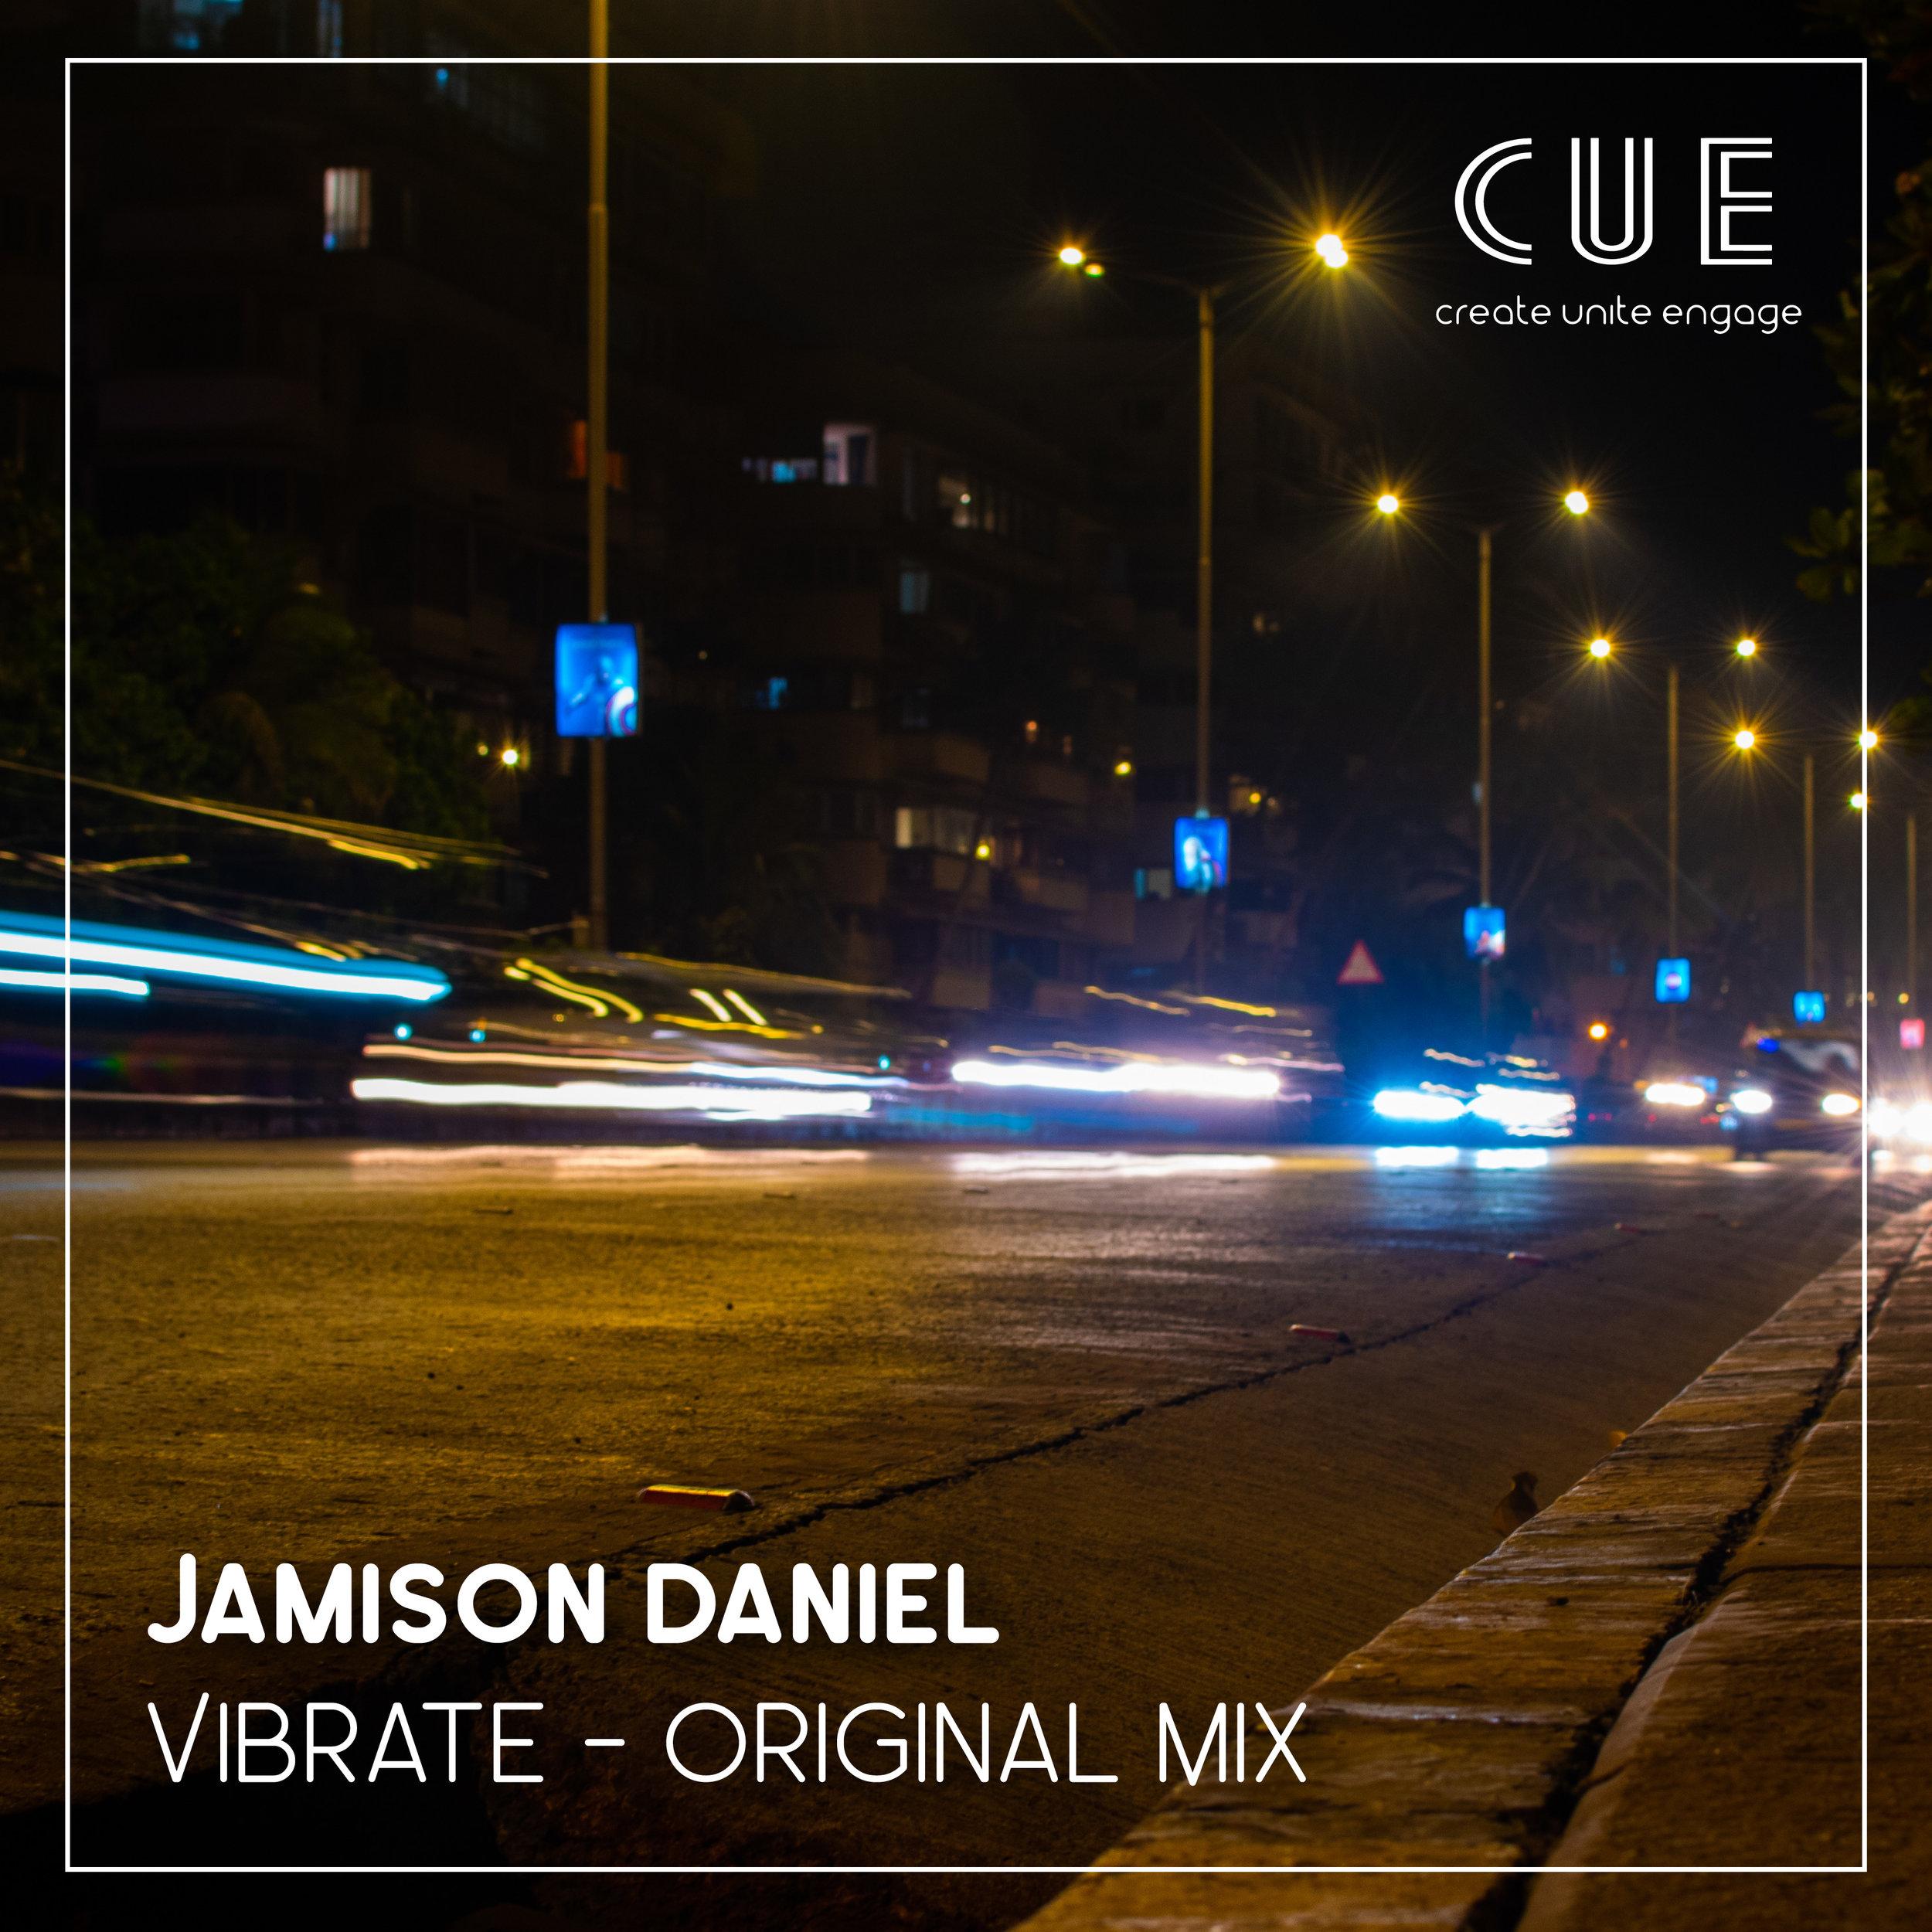 Jamison Daniel - Vibrate-01 Art.jpg